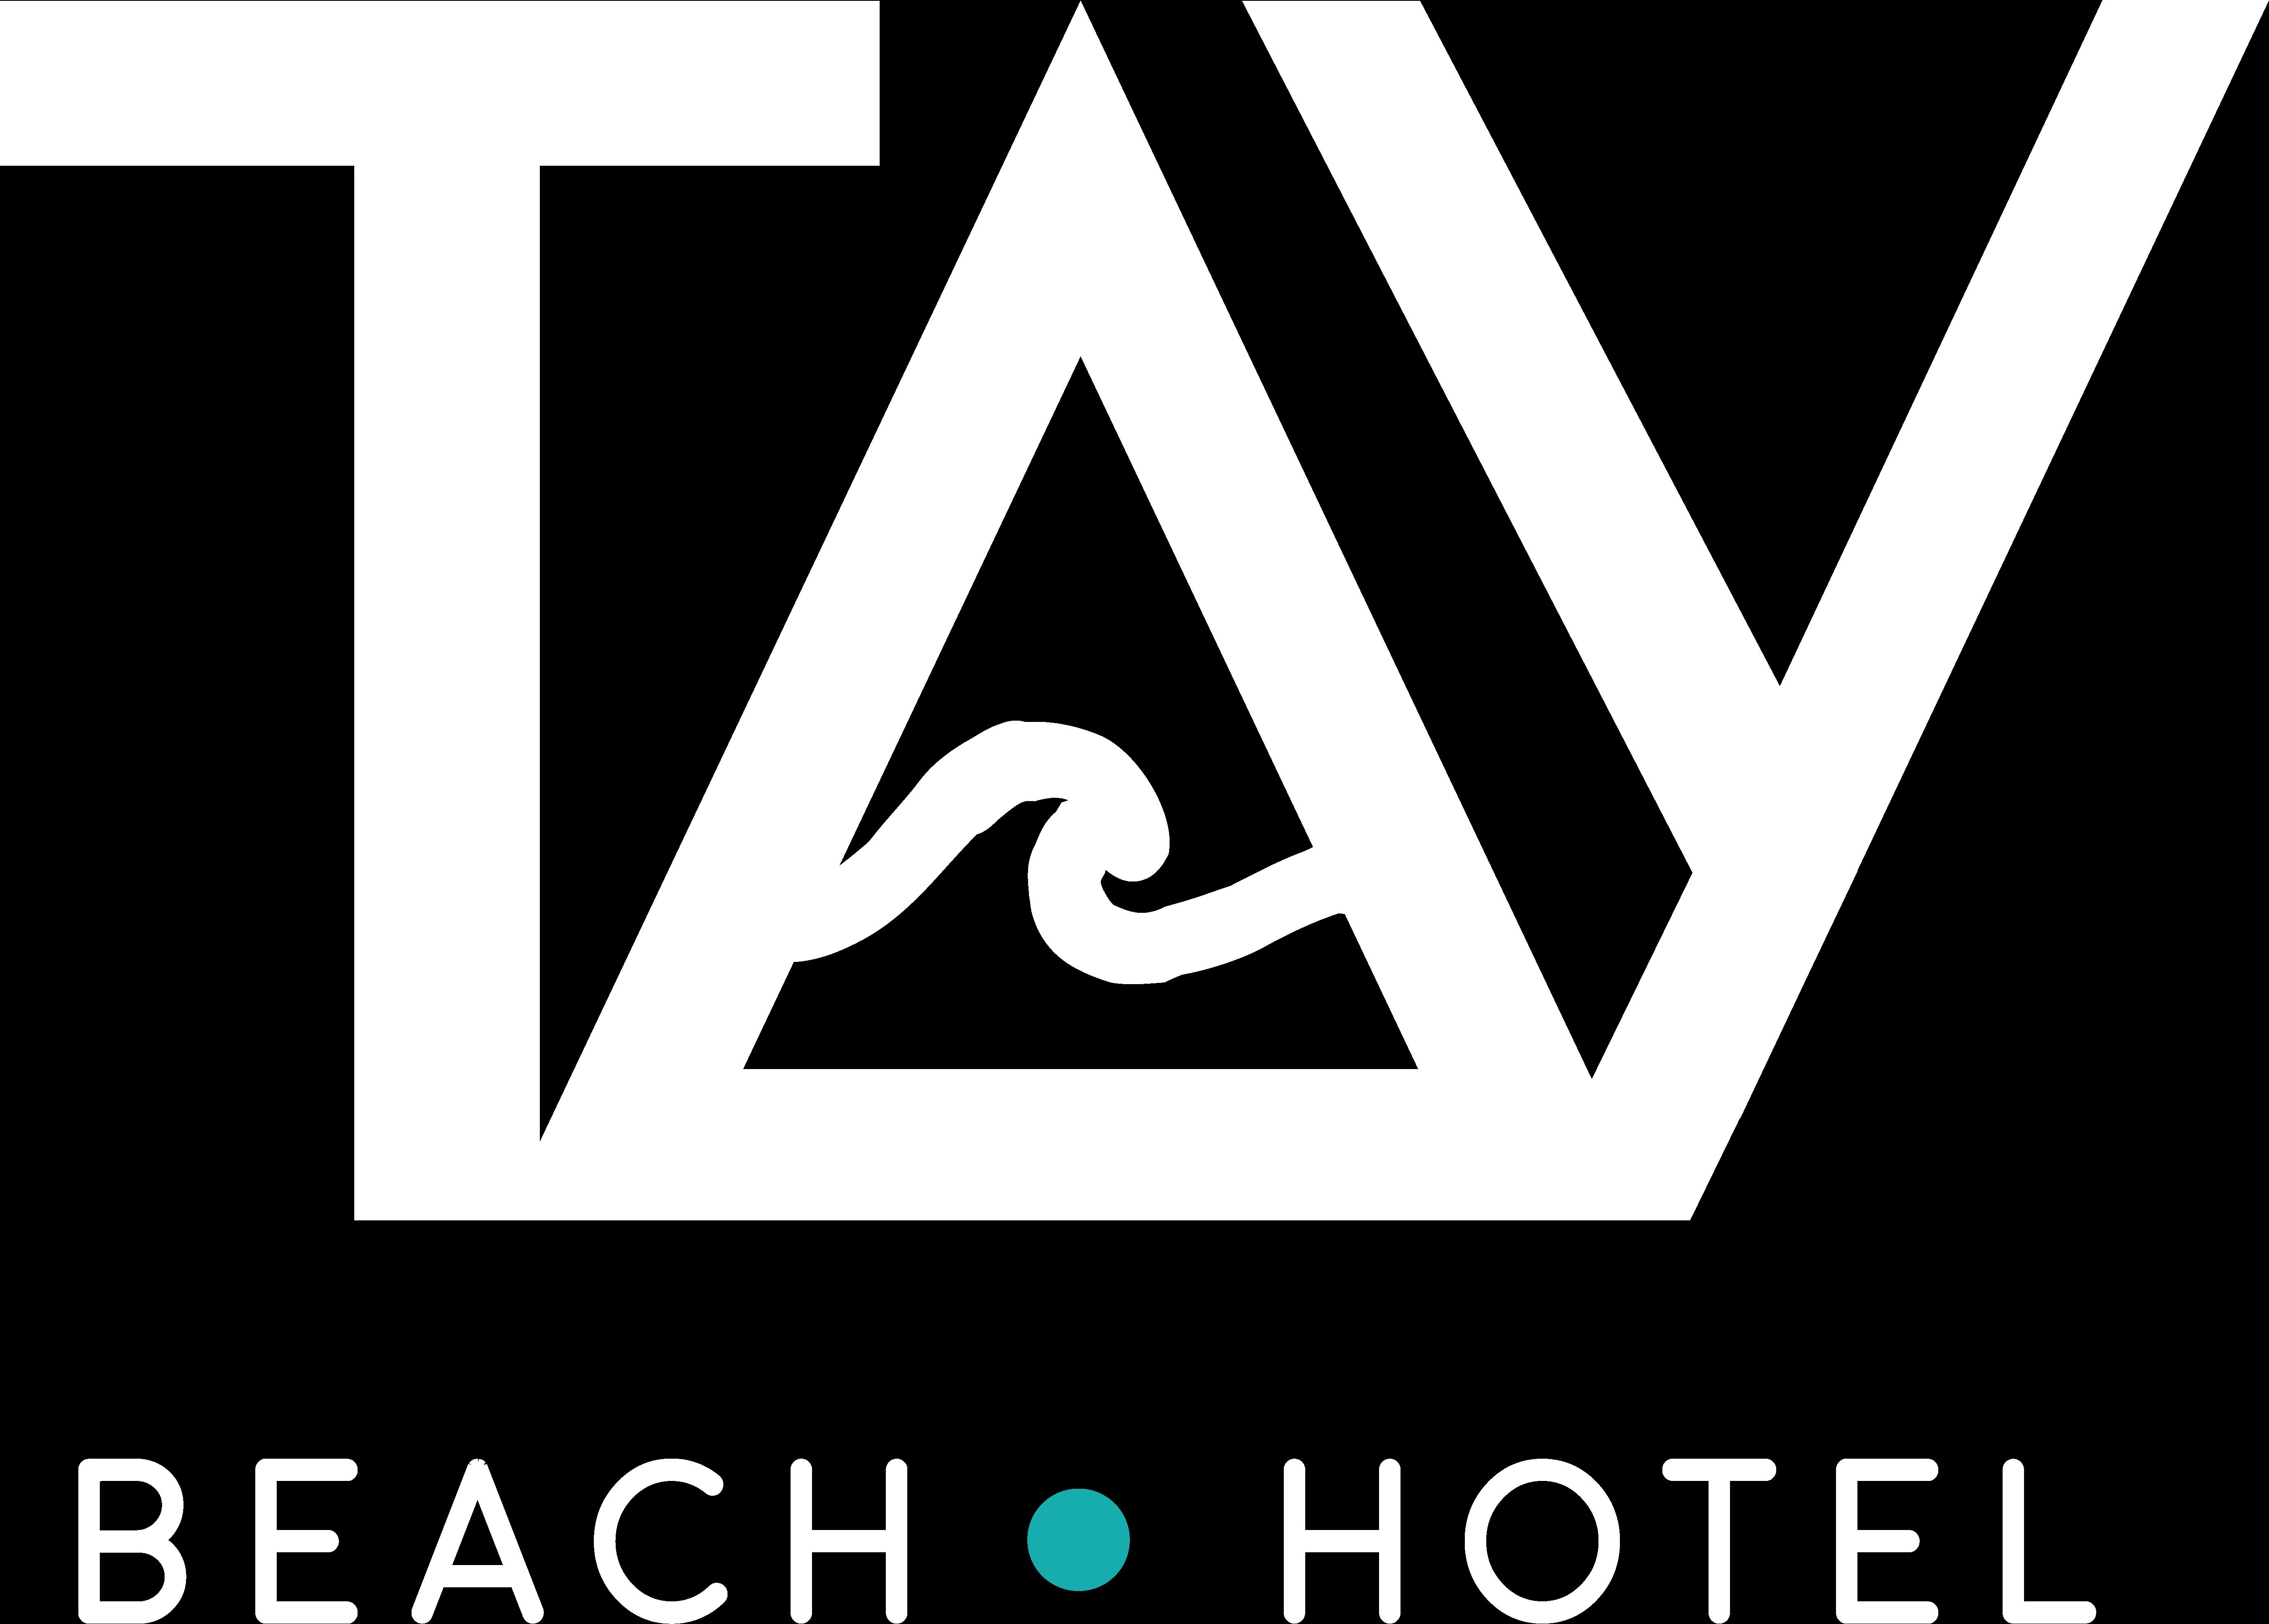 Tay Beach Logo